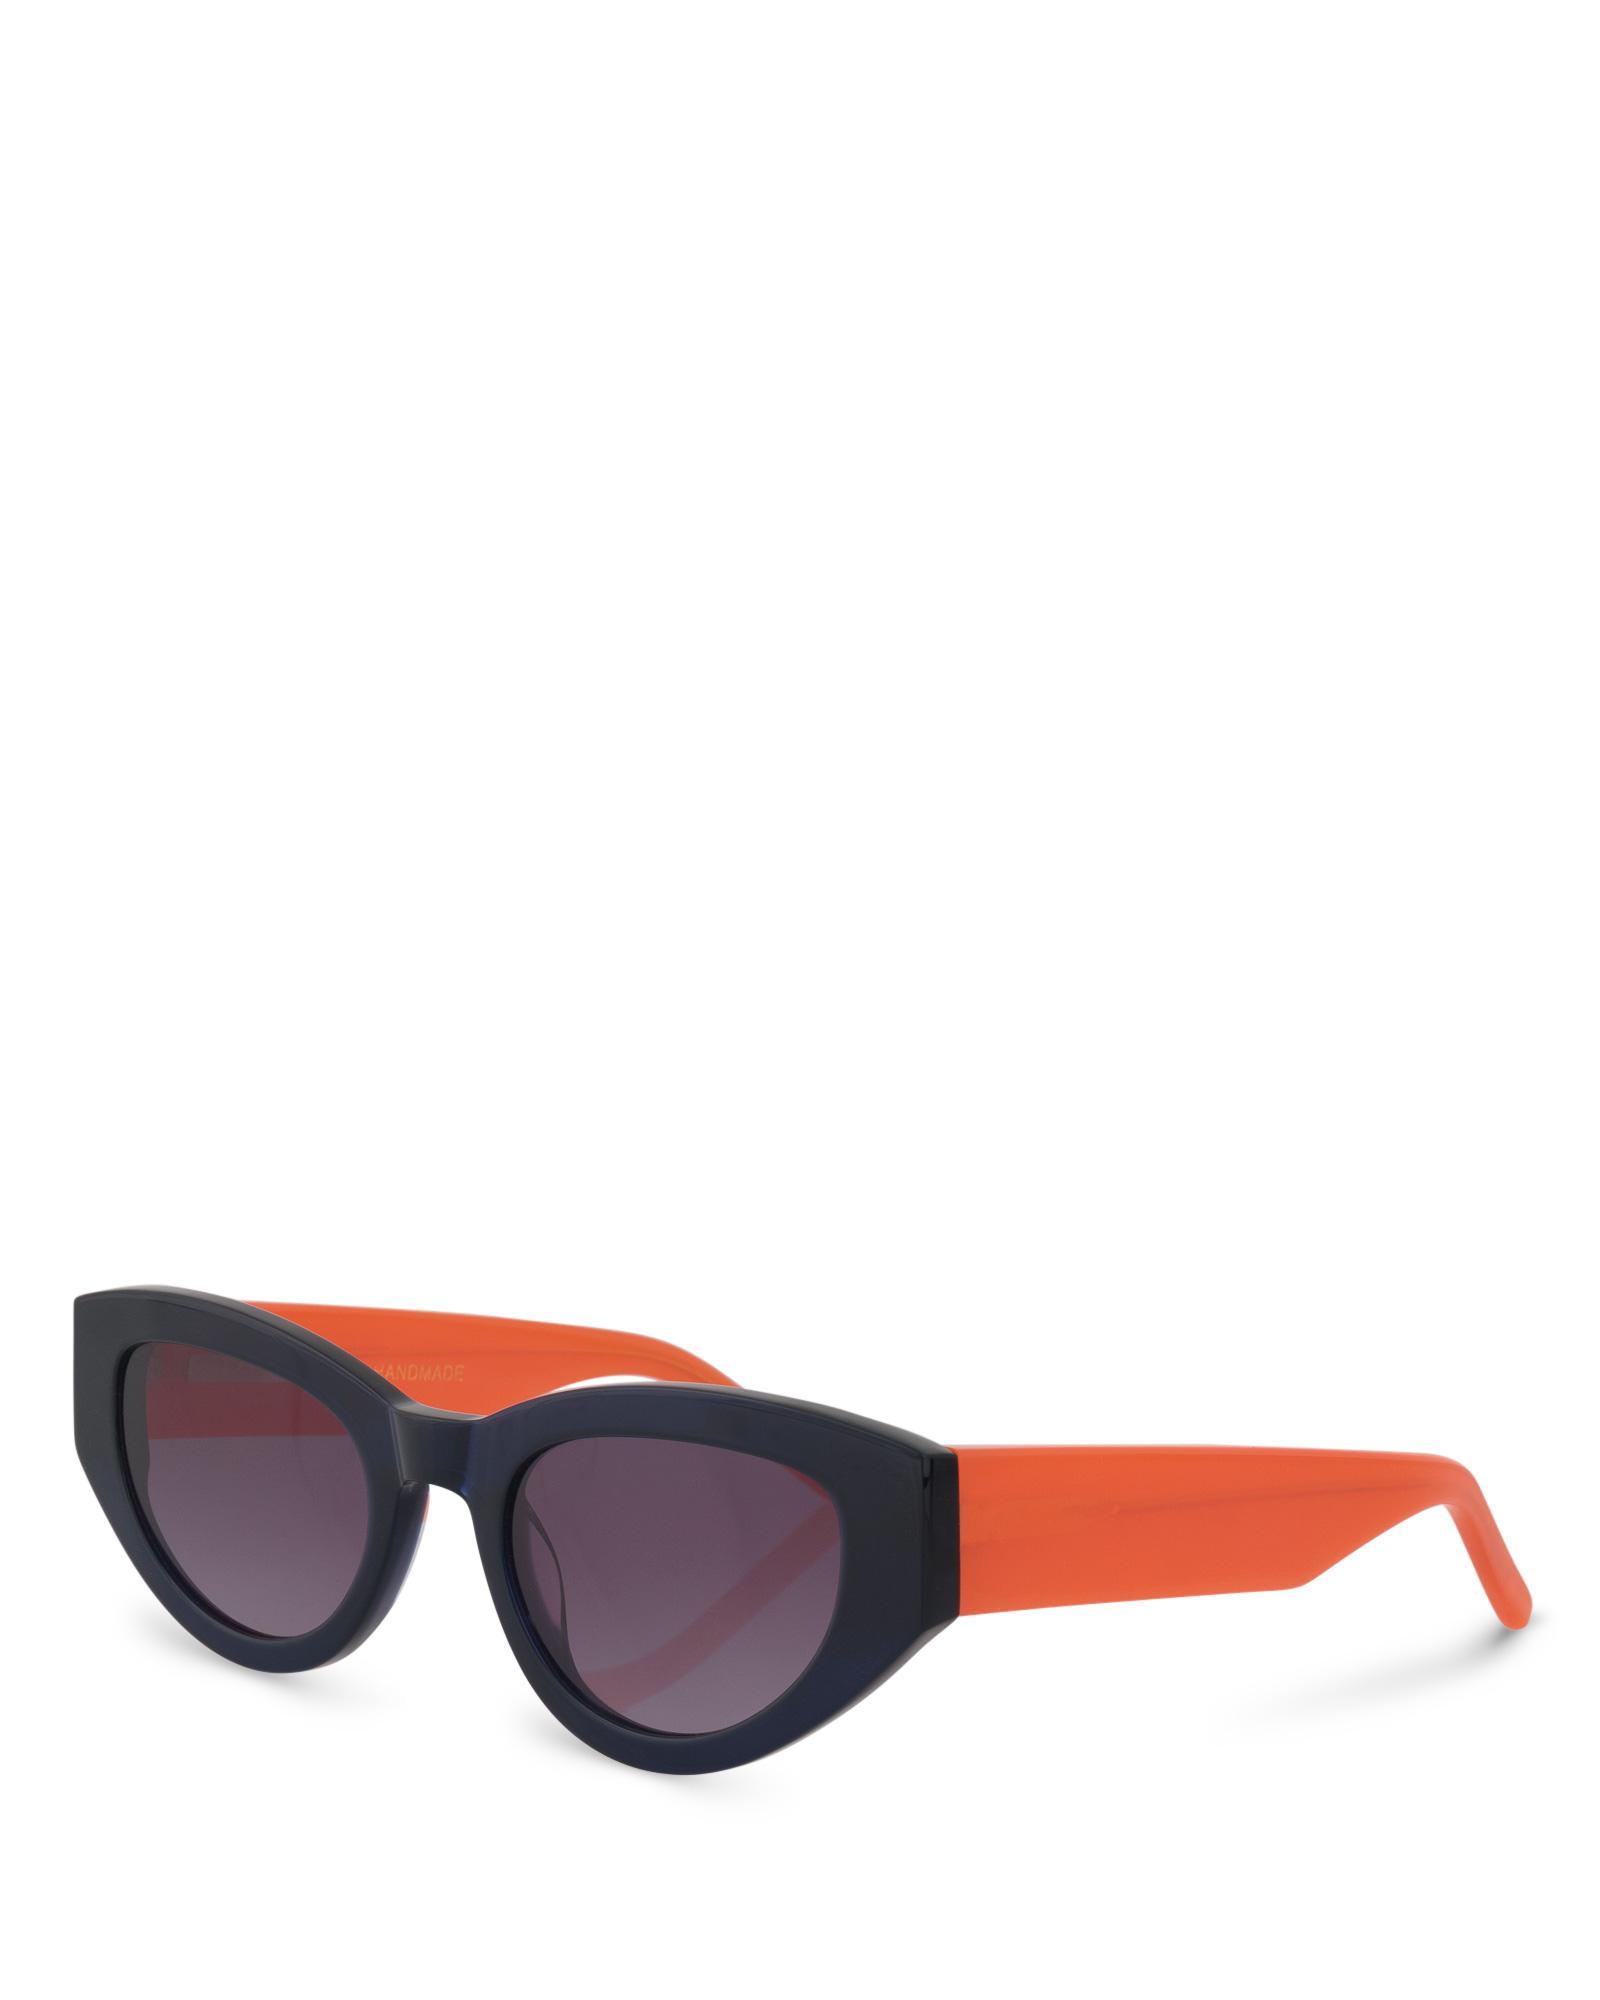 04d4f4deb Oliver Bonas Berlin Navy & Orange Sunglasses in Blue - Lyst